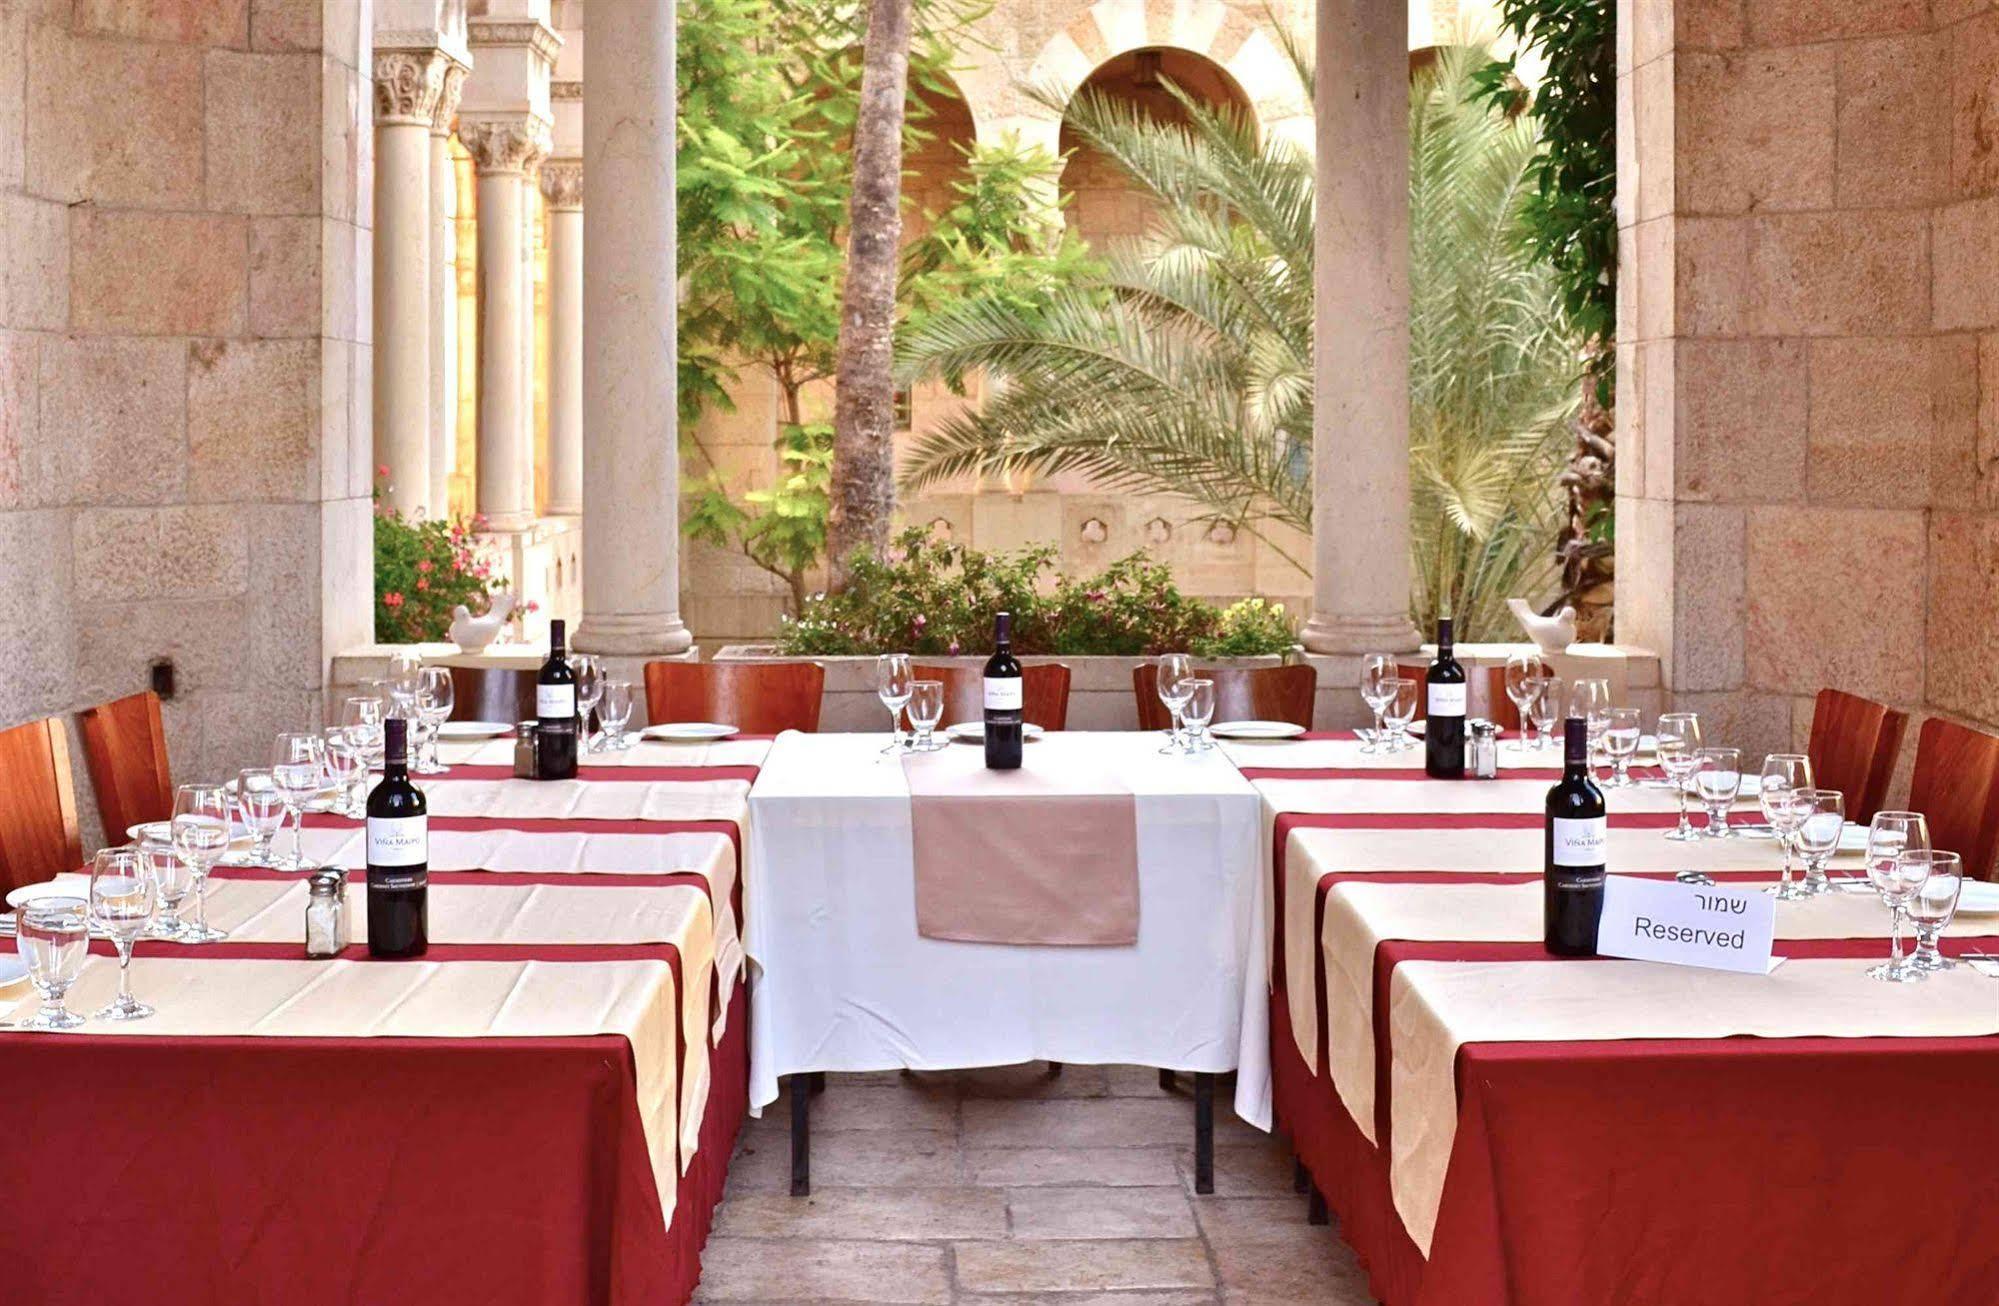 Ymca Three Arches Hotel, Jerusalem Image 20